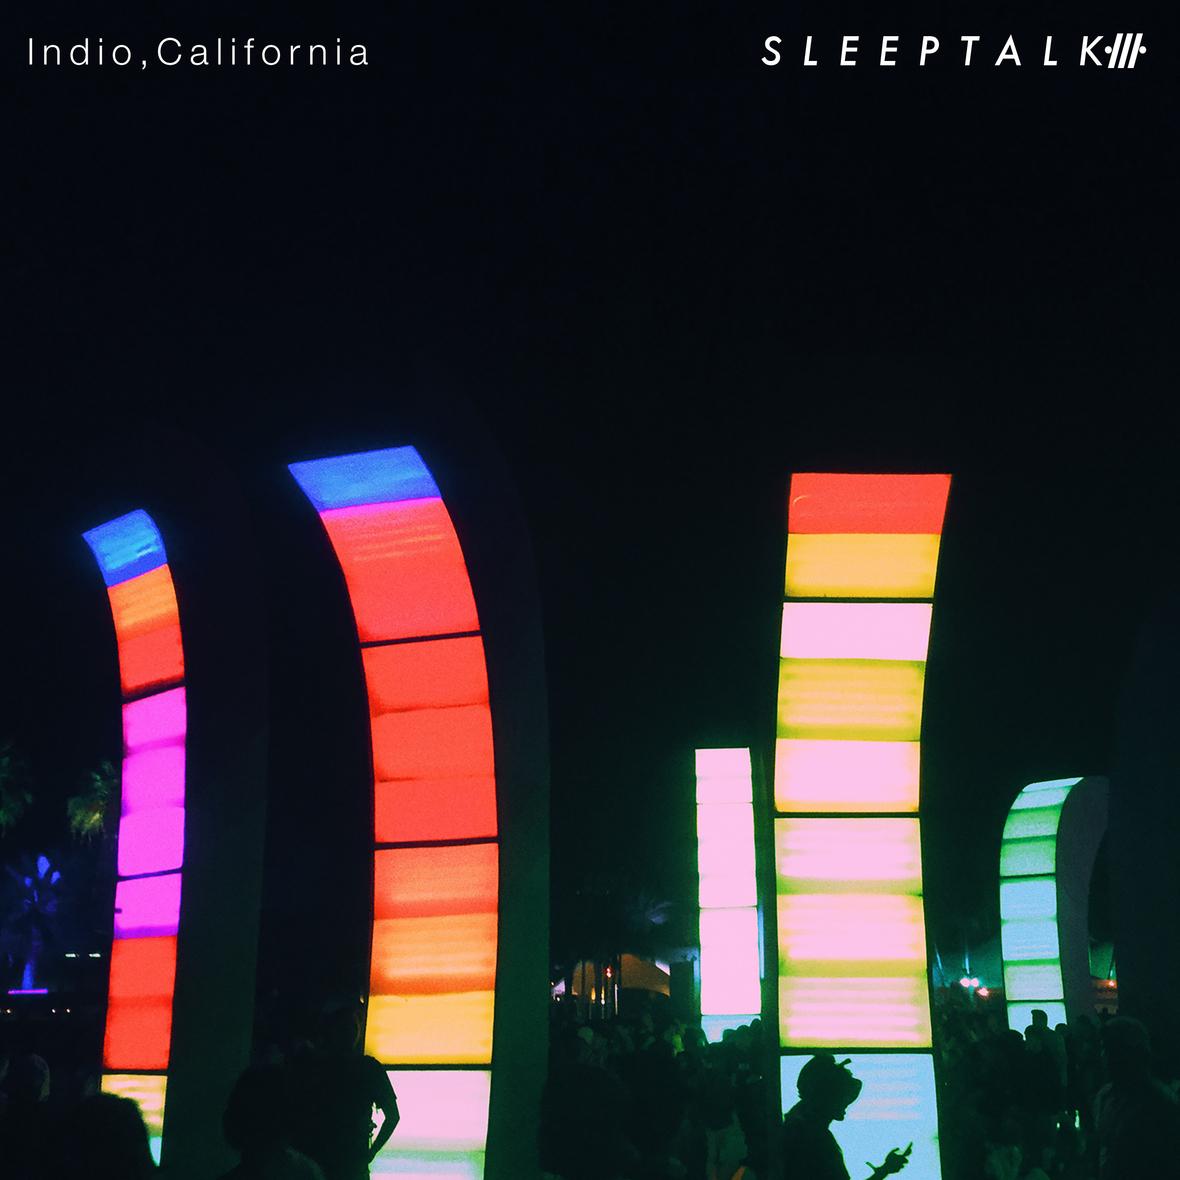 indio single cover